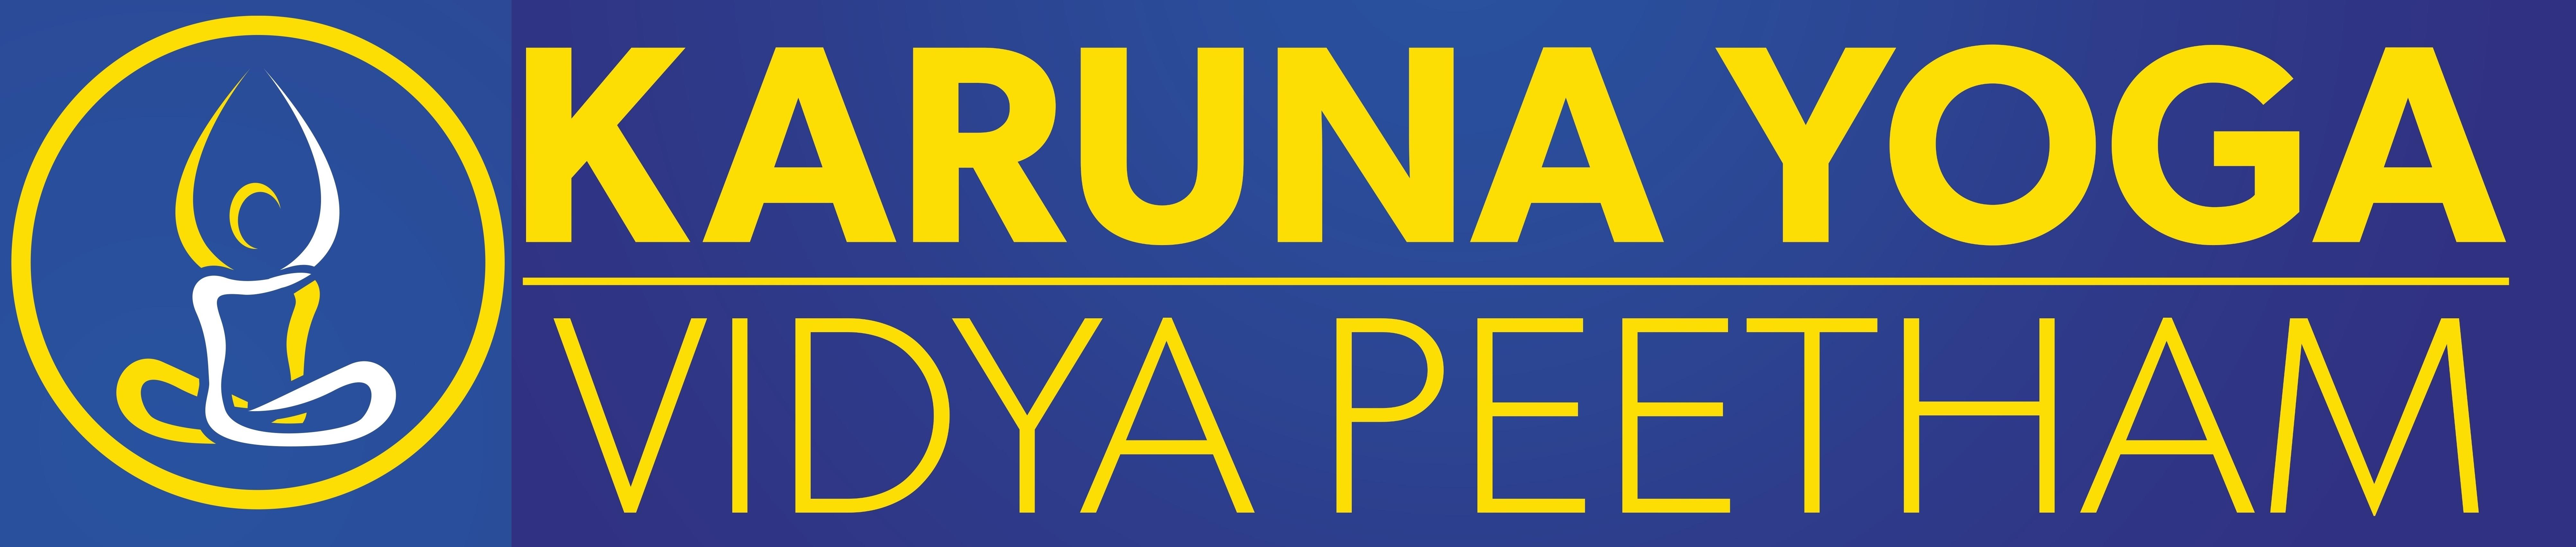 Karuna Yoga-Best Yoga Teacher Training Course. Bangalore, India